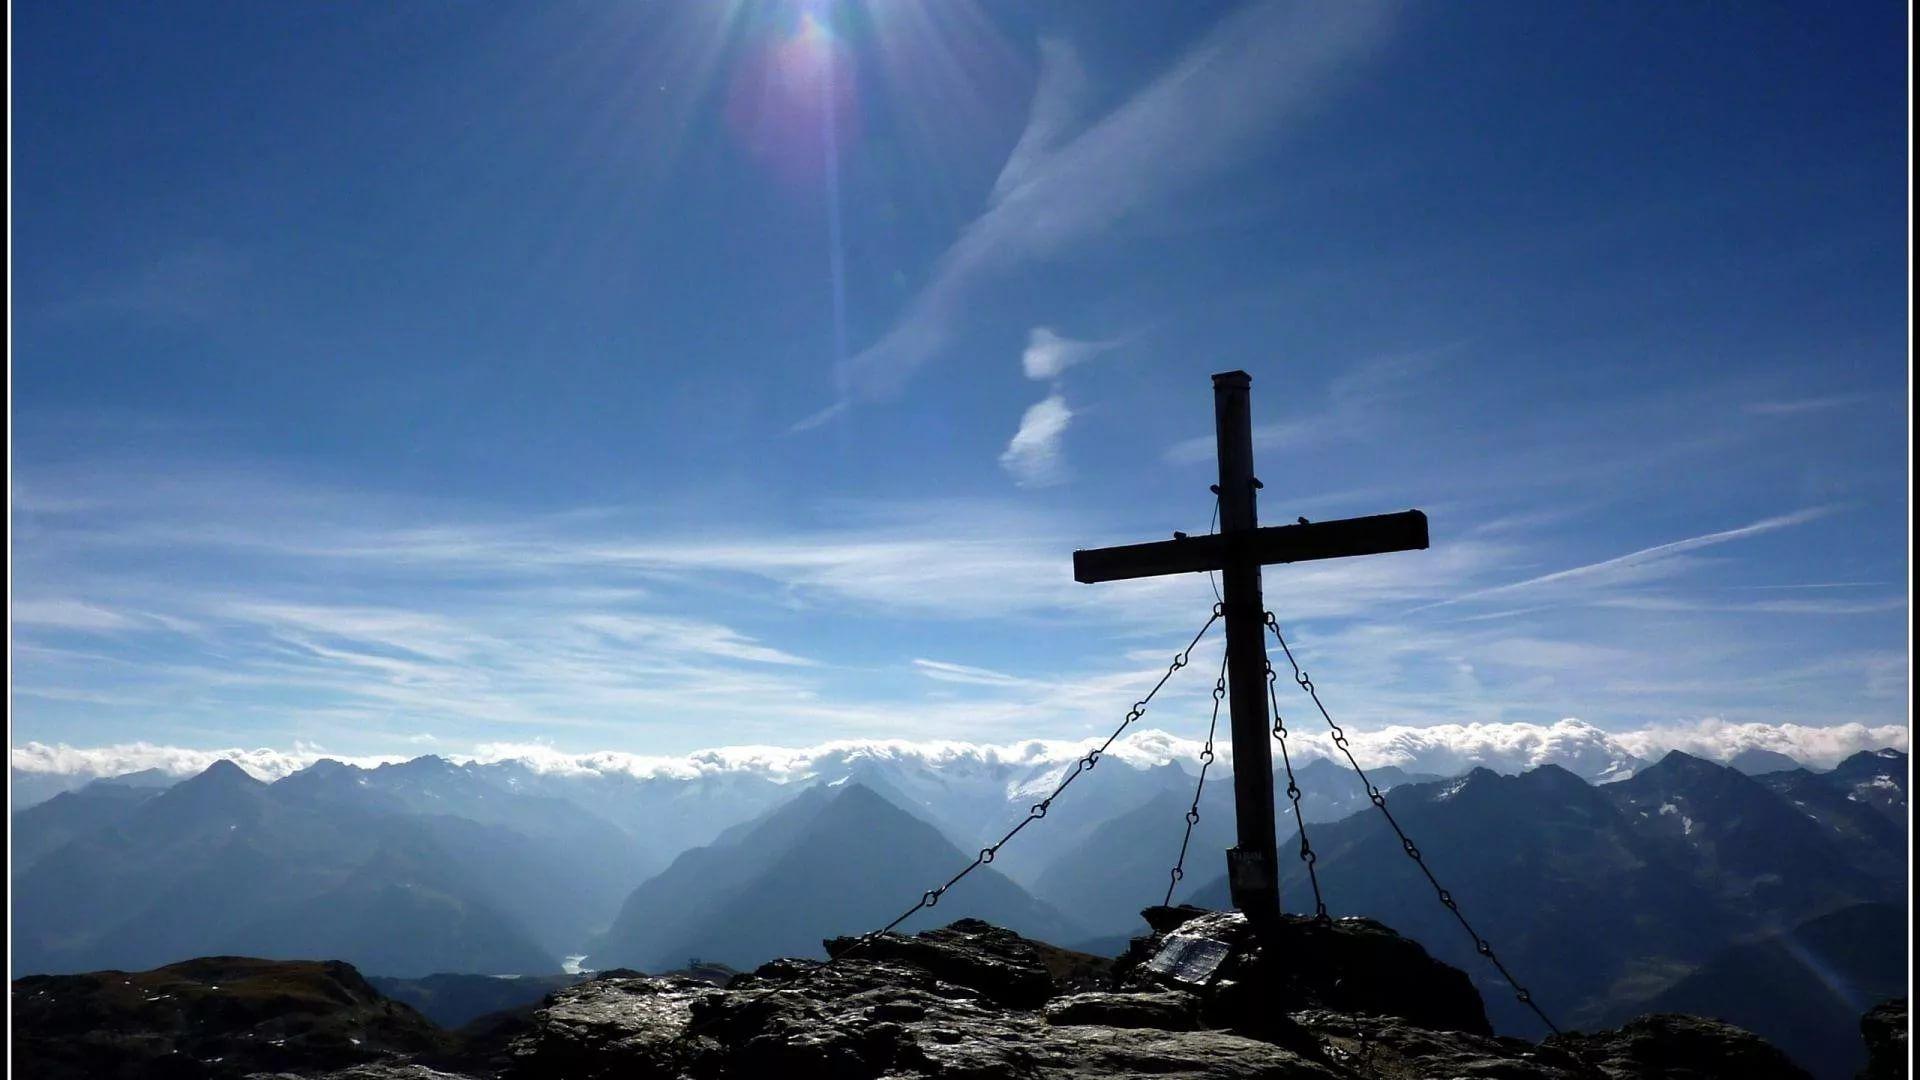 Jesus Cross hd wallpaper download